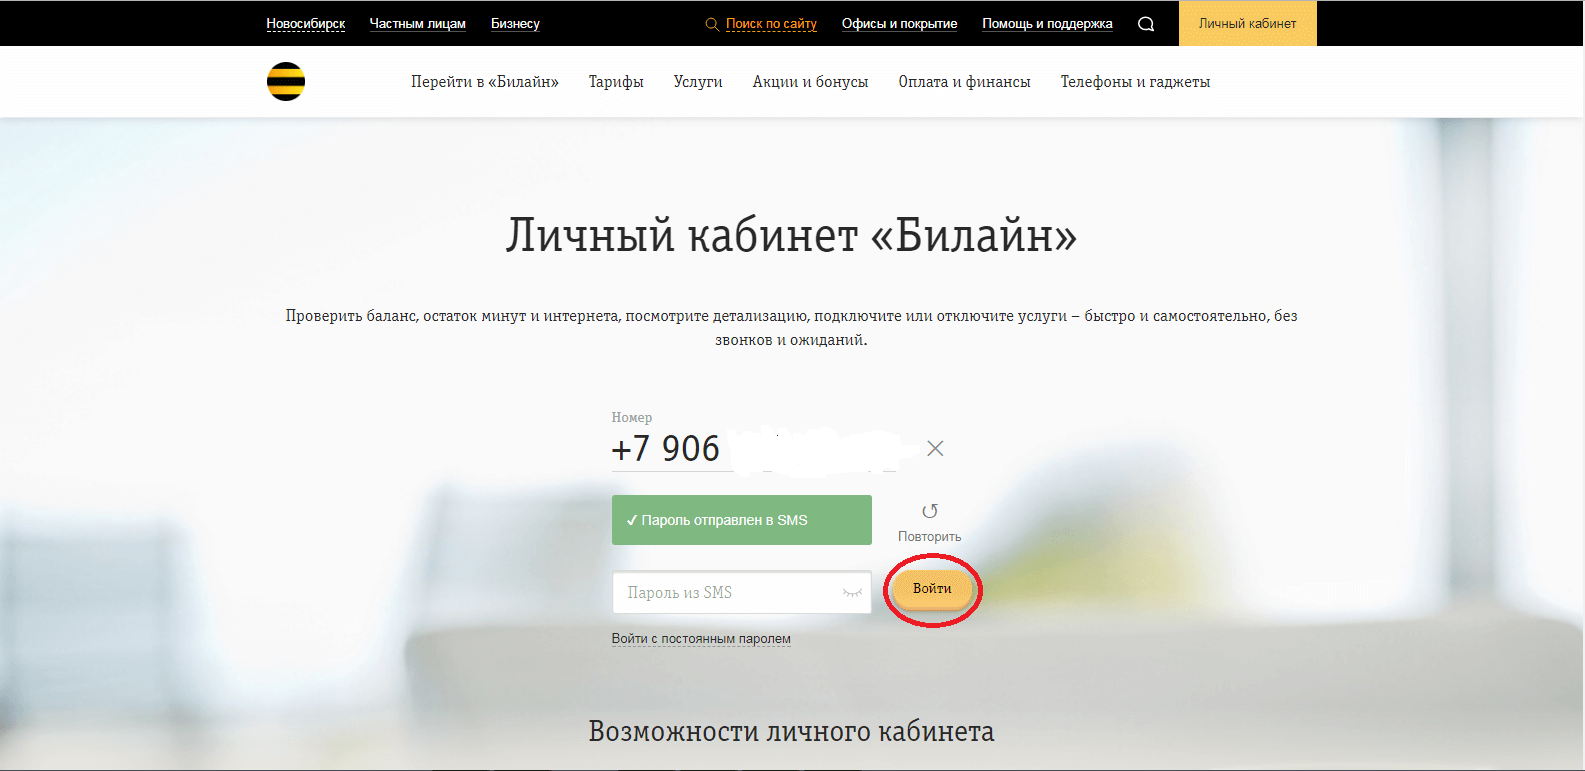 Билайн личный кабинет Кострома